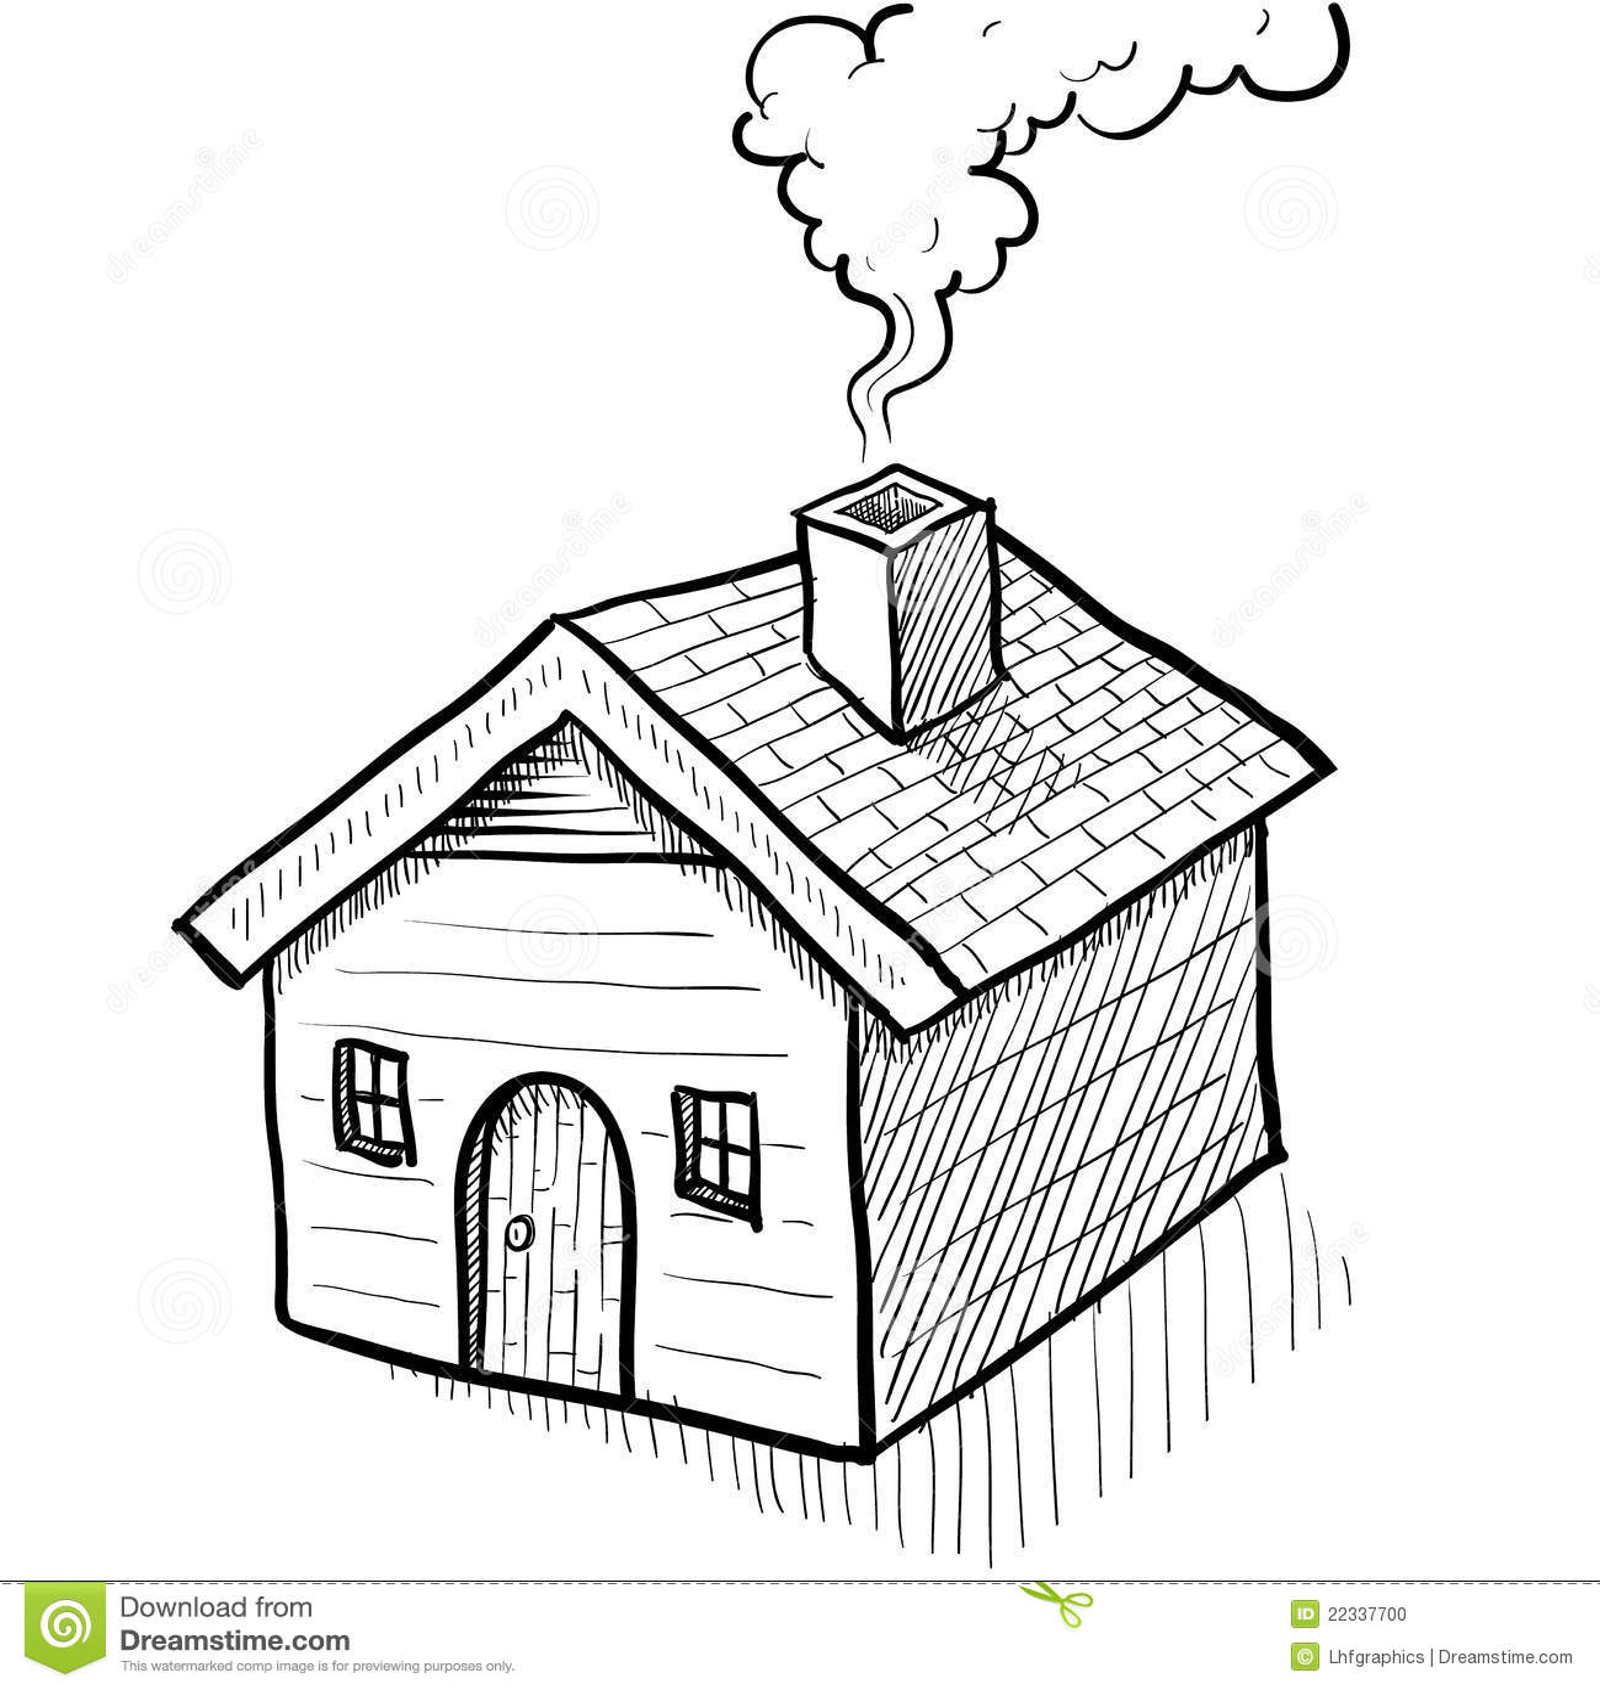 Comfy House Sketch Stock Photo